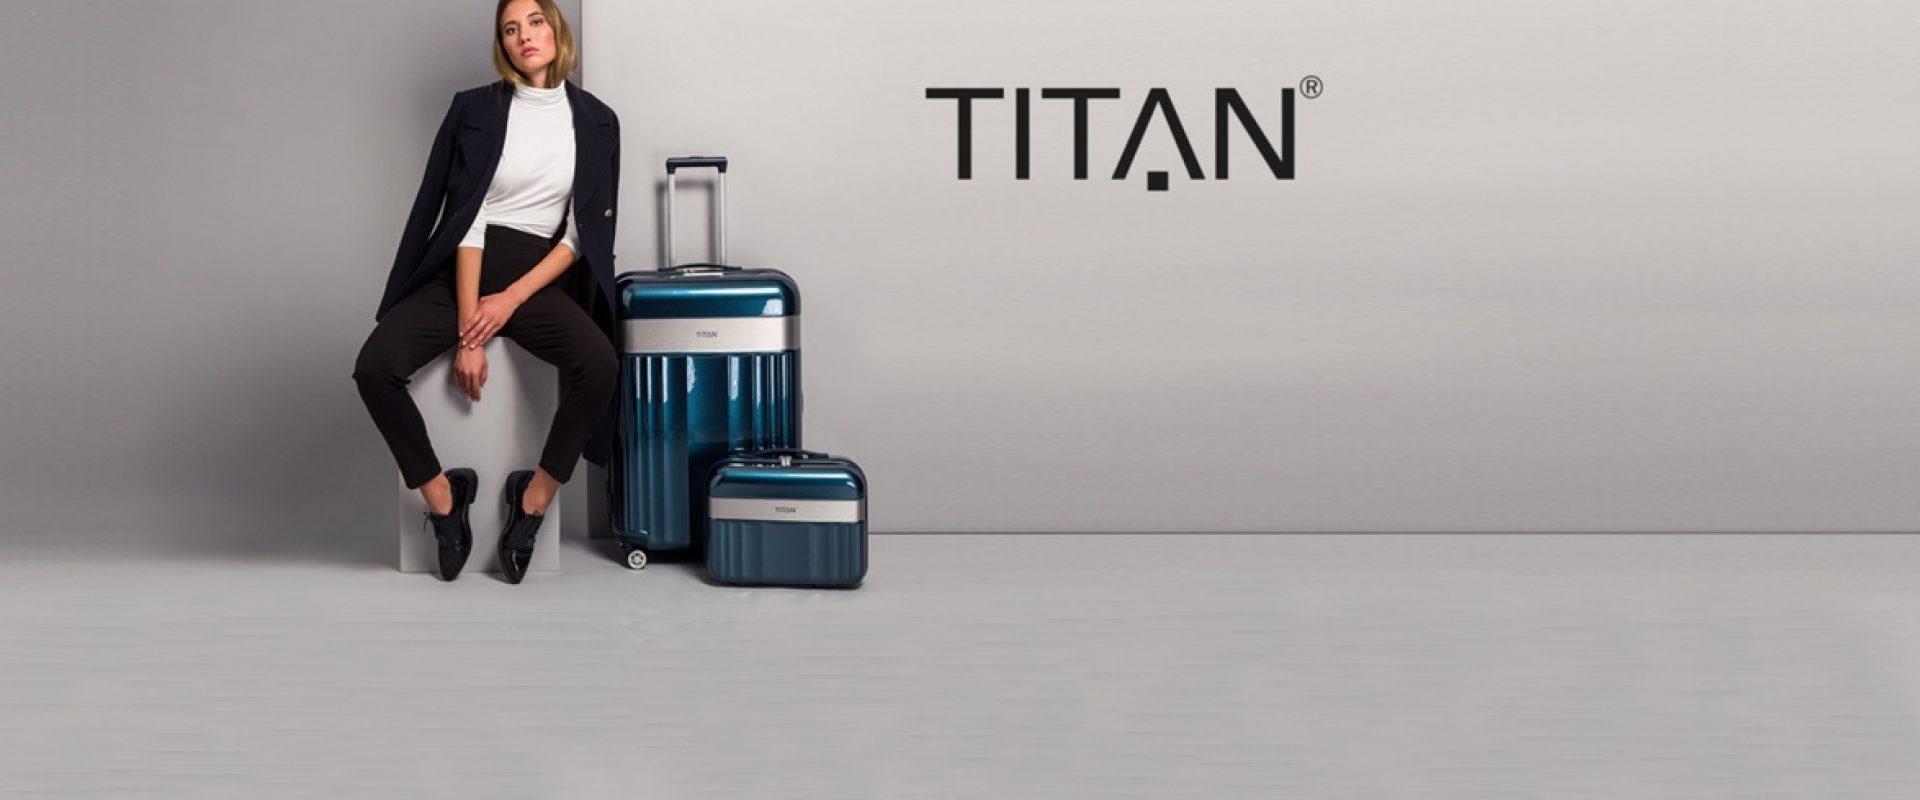 Teaser_Titan_1